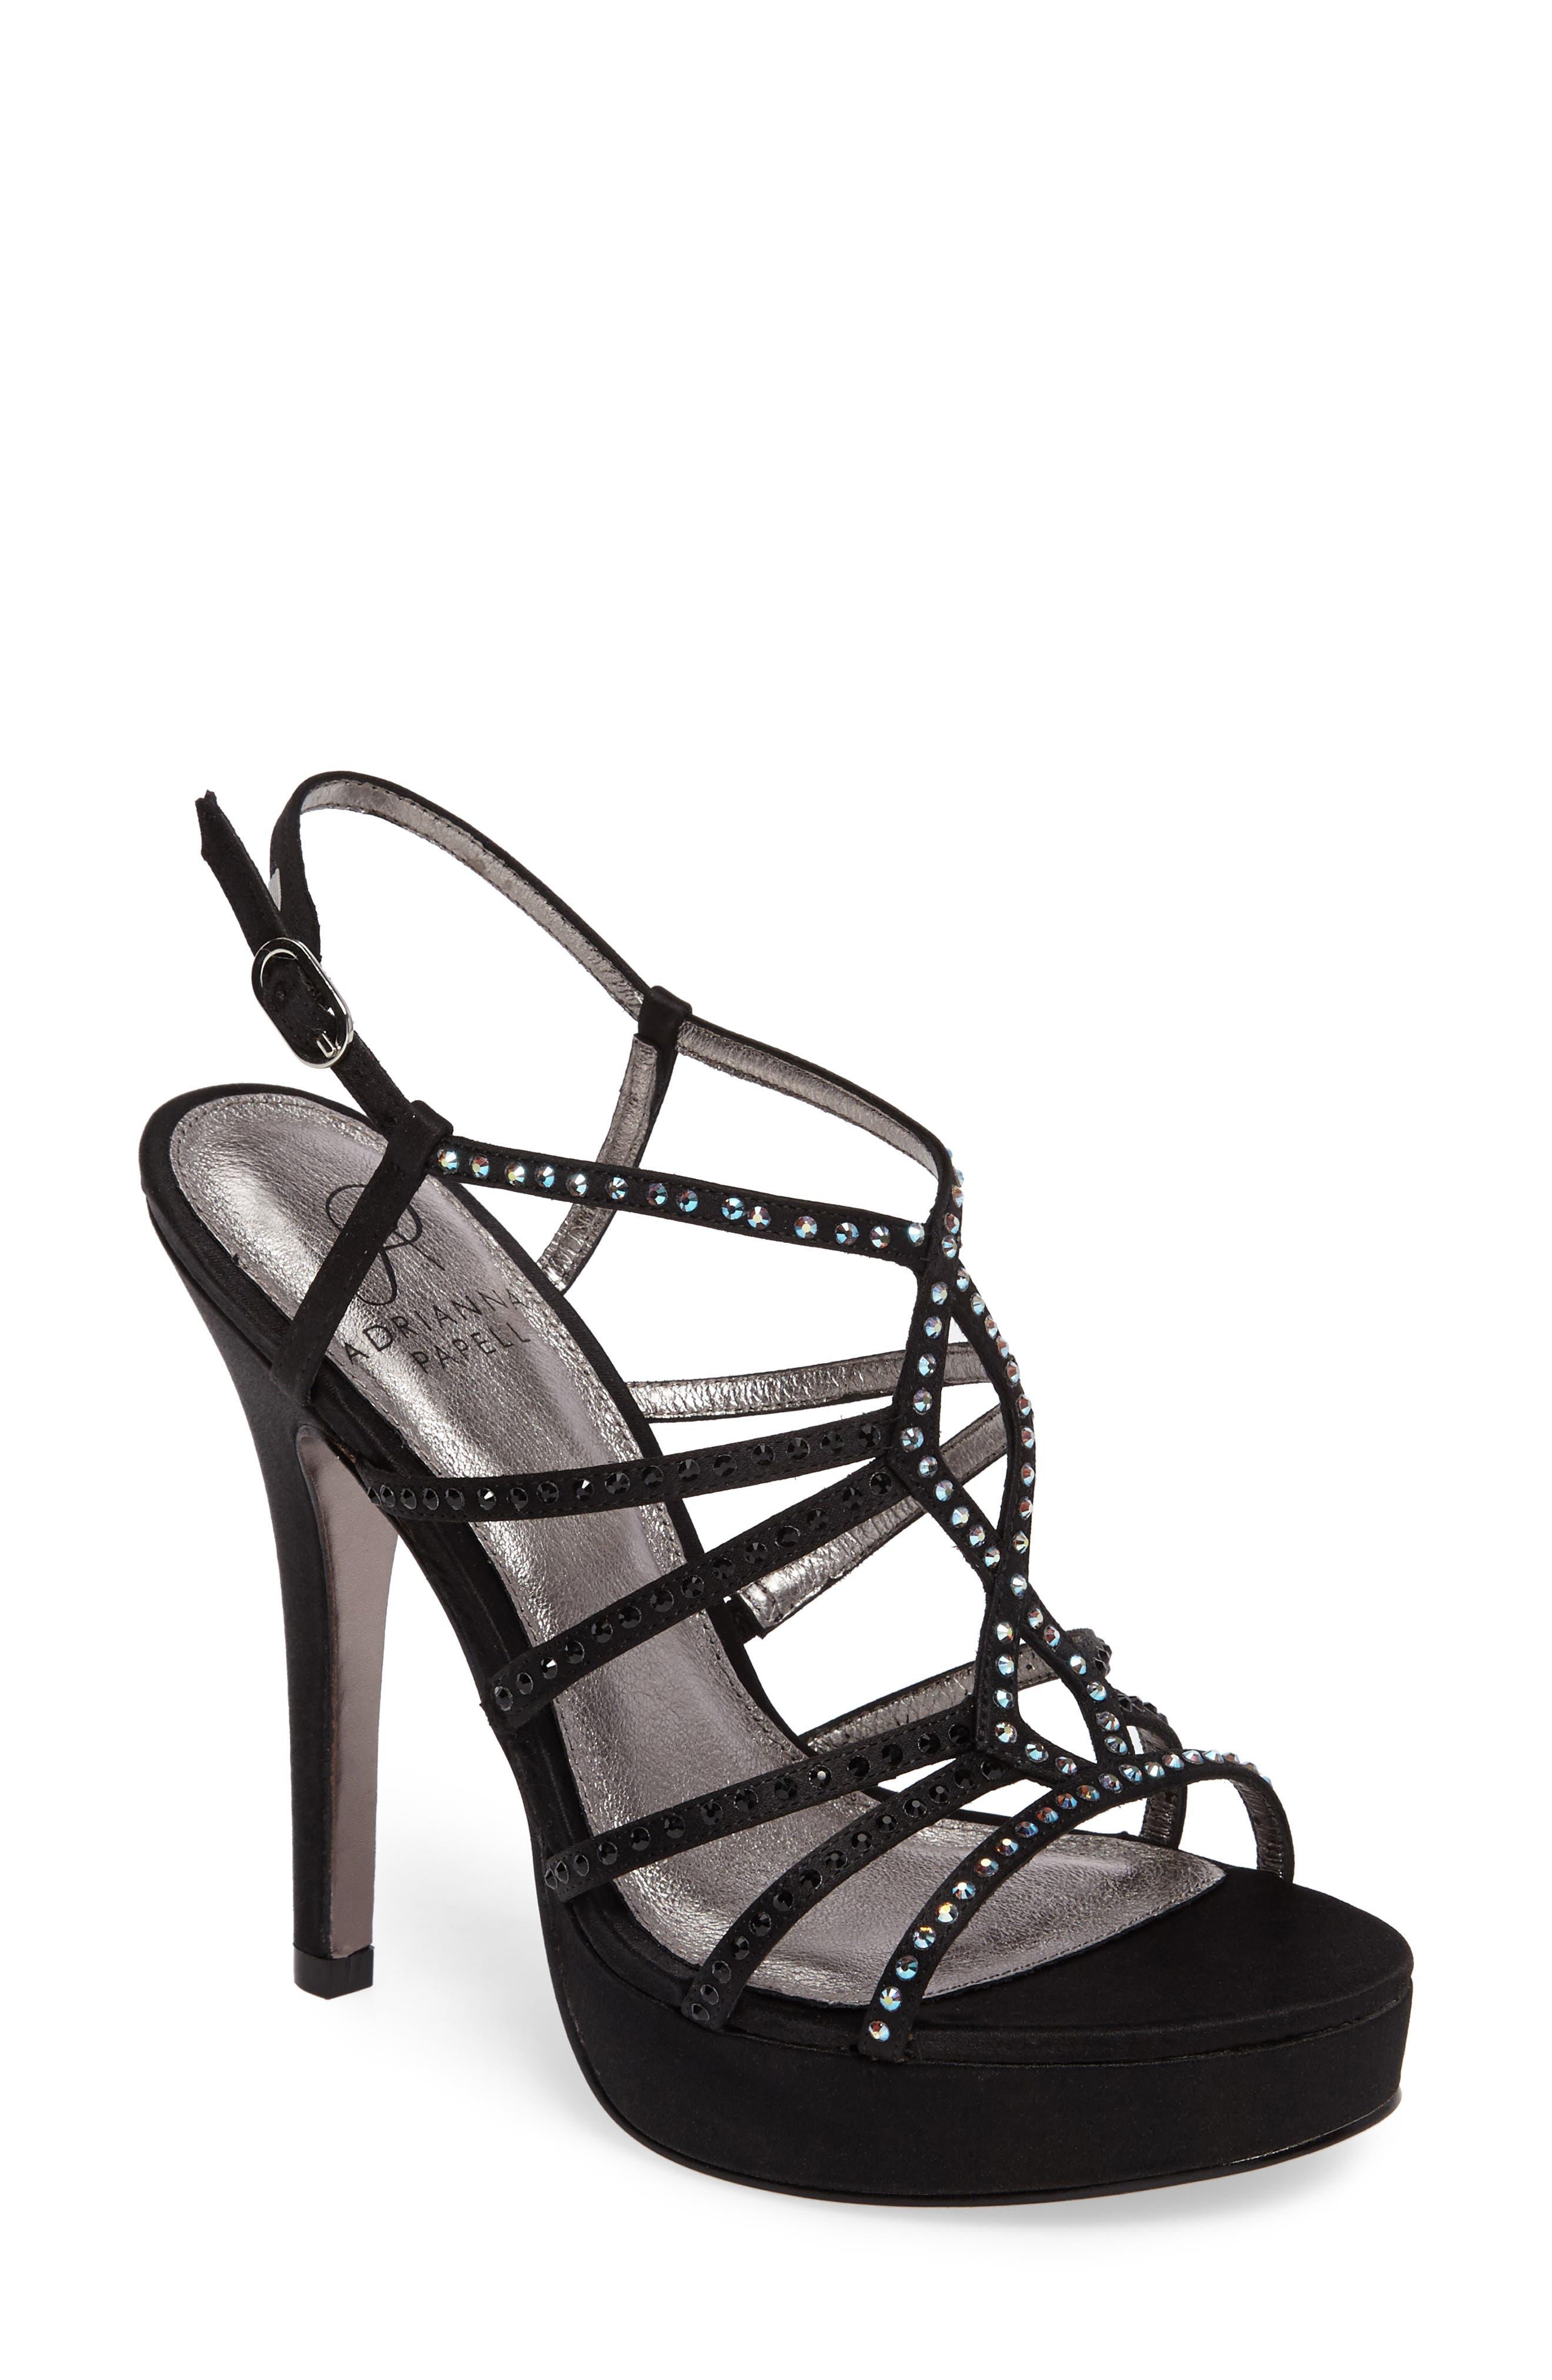 Alternate Image 1 Selected - Adrianna Papell Miranda Embellished Platform Sandal (Women)